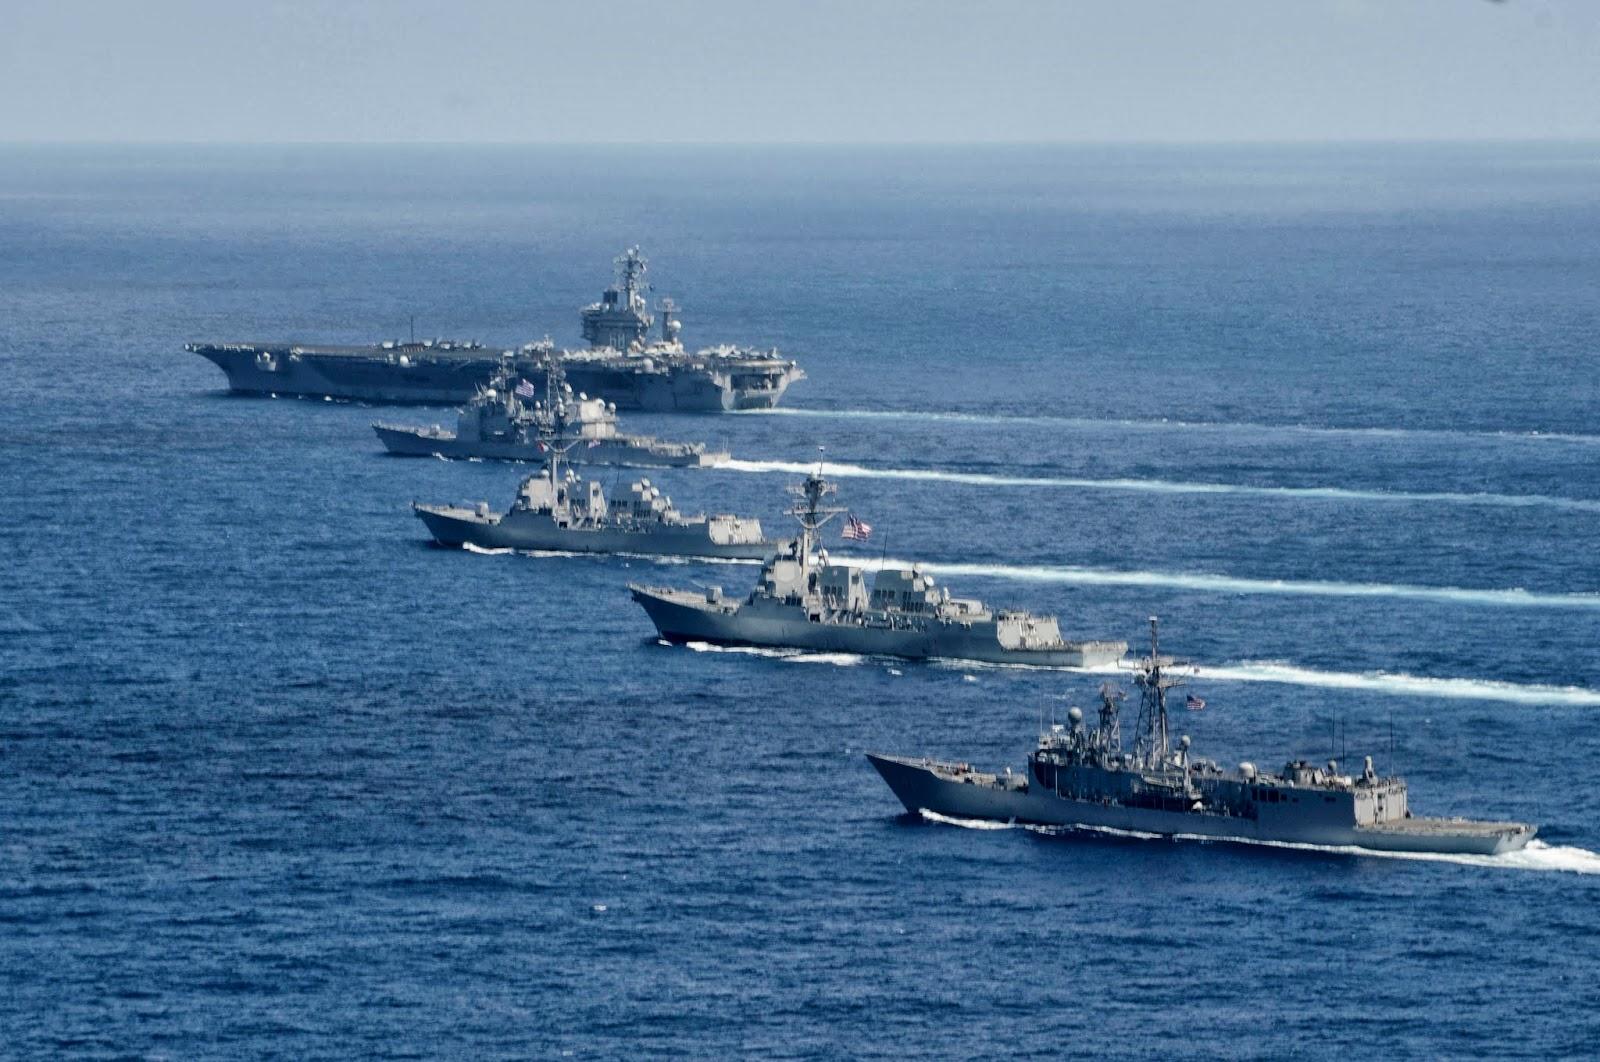 Accompanying+battle+group+of+the+nuclear+aircraft+carrier++USS+Nimitz+CVN-68.jpg